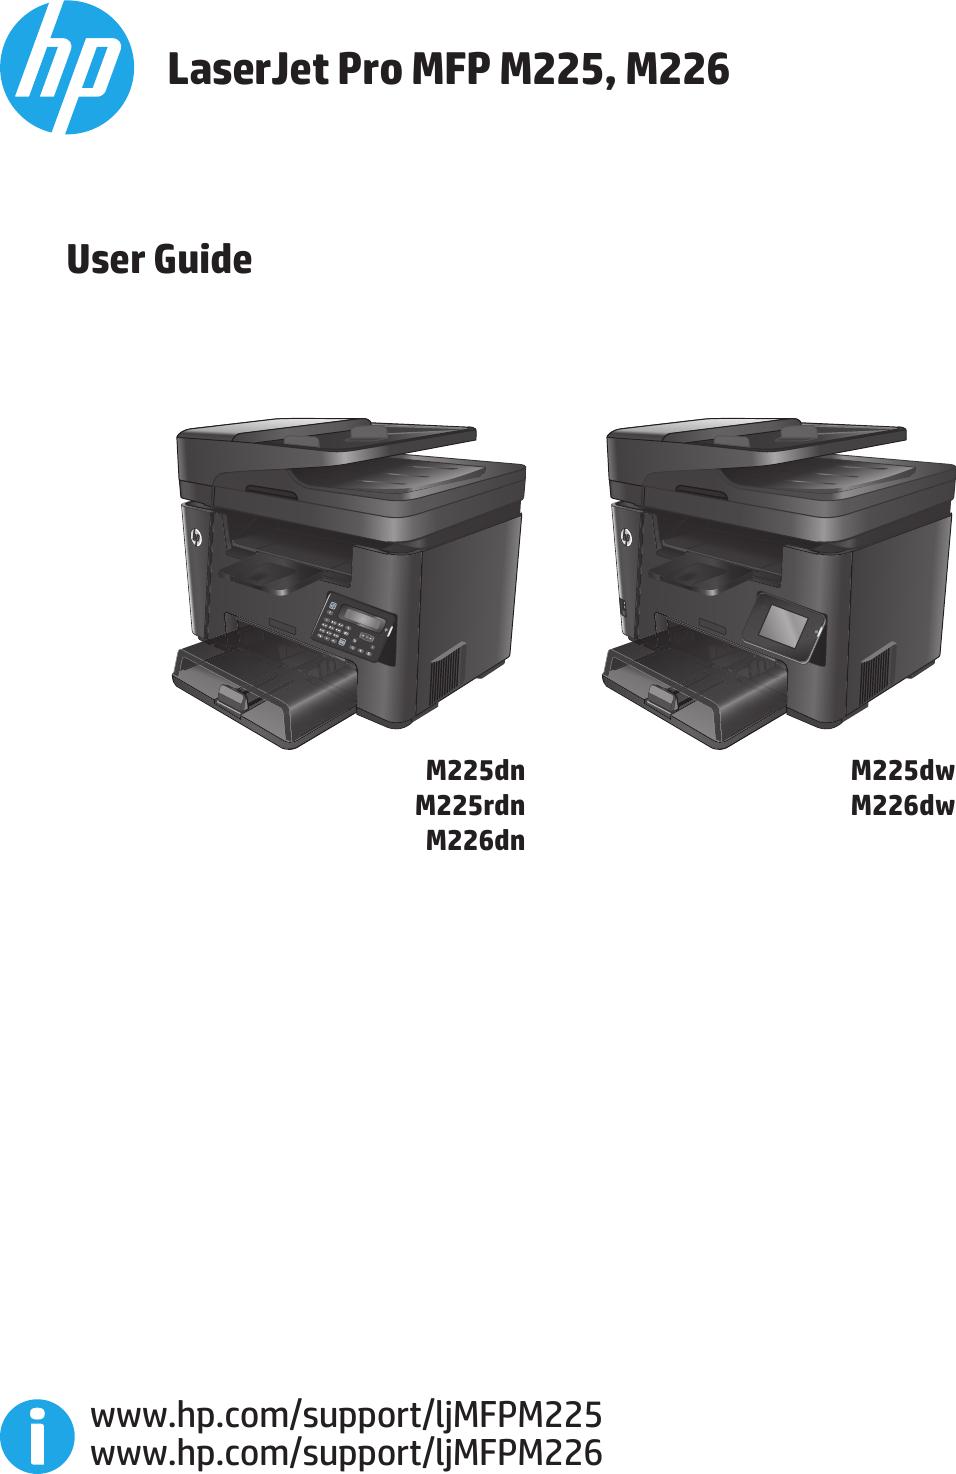 Hp Laserjet Pro Mfp M225Dn Users Manual M225, M226